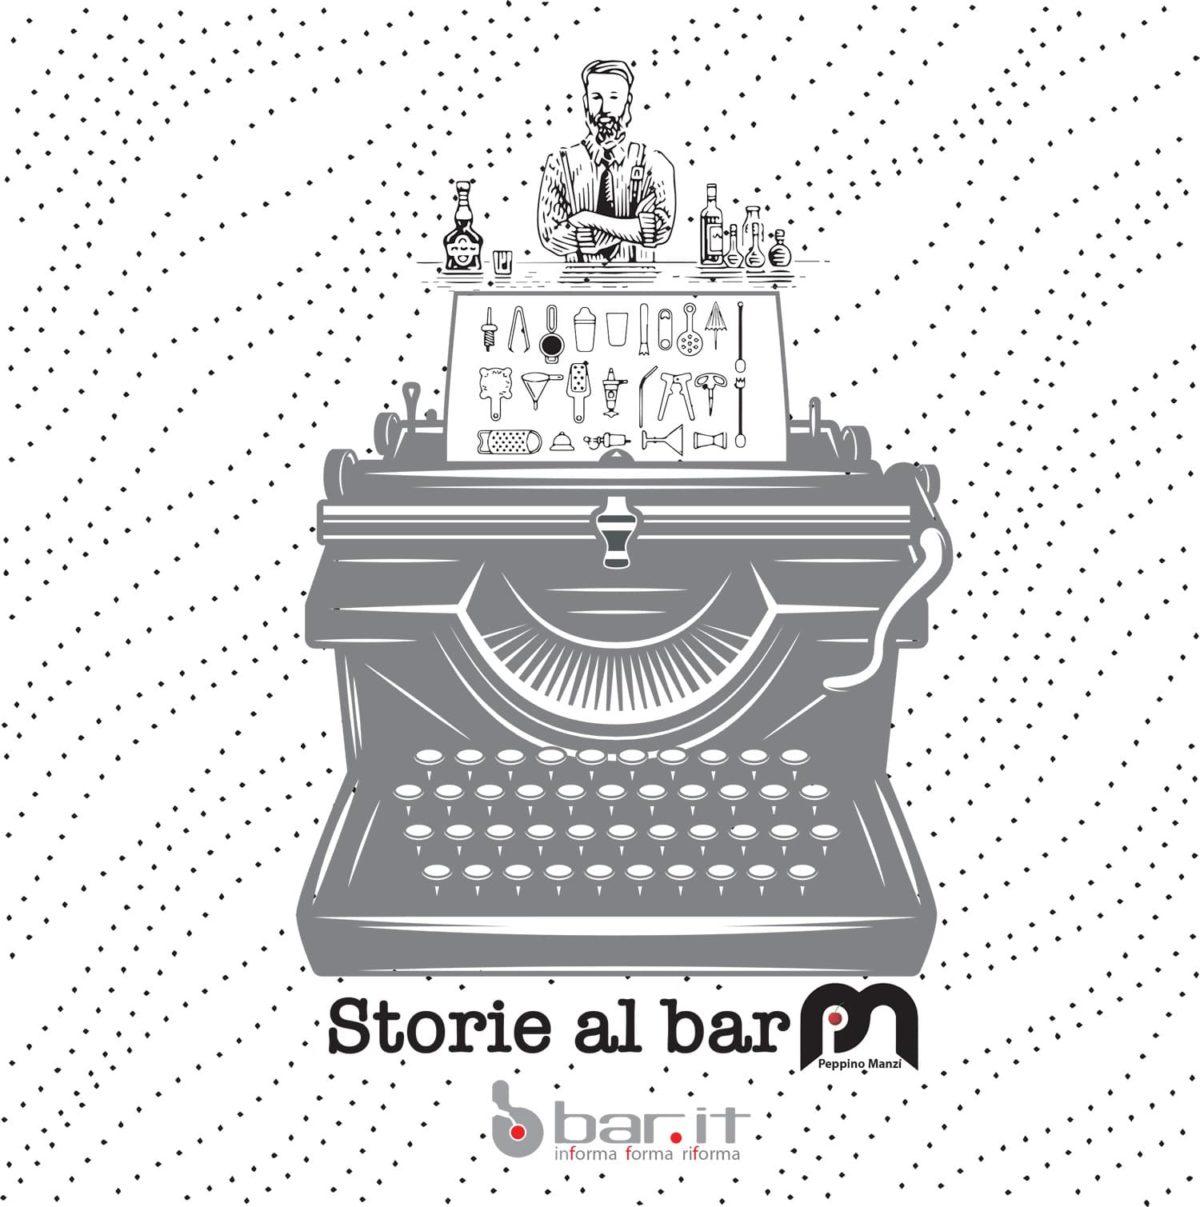 Storie al bar